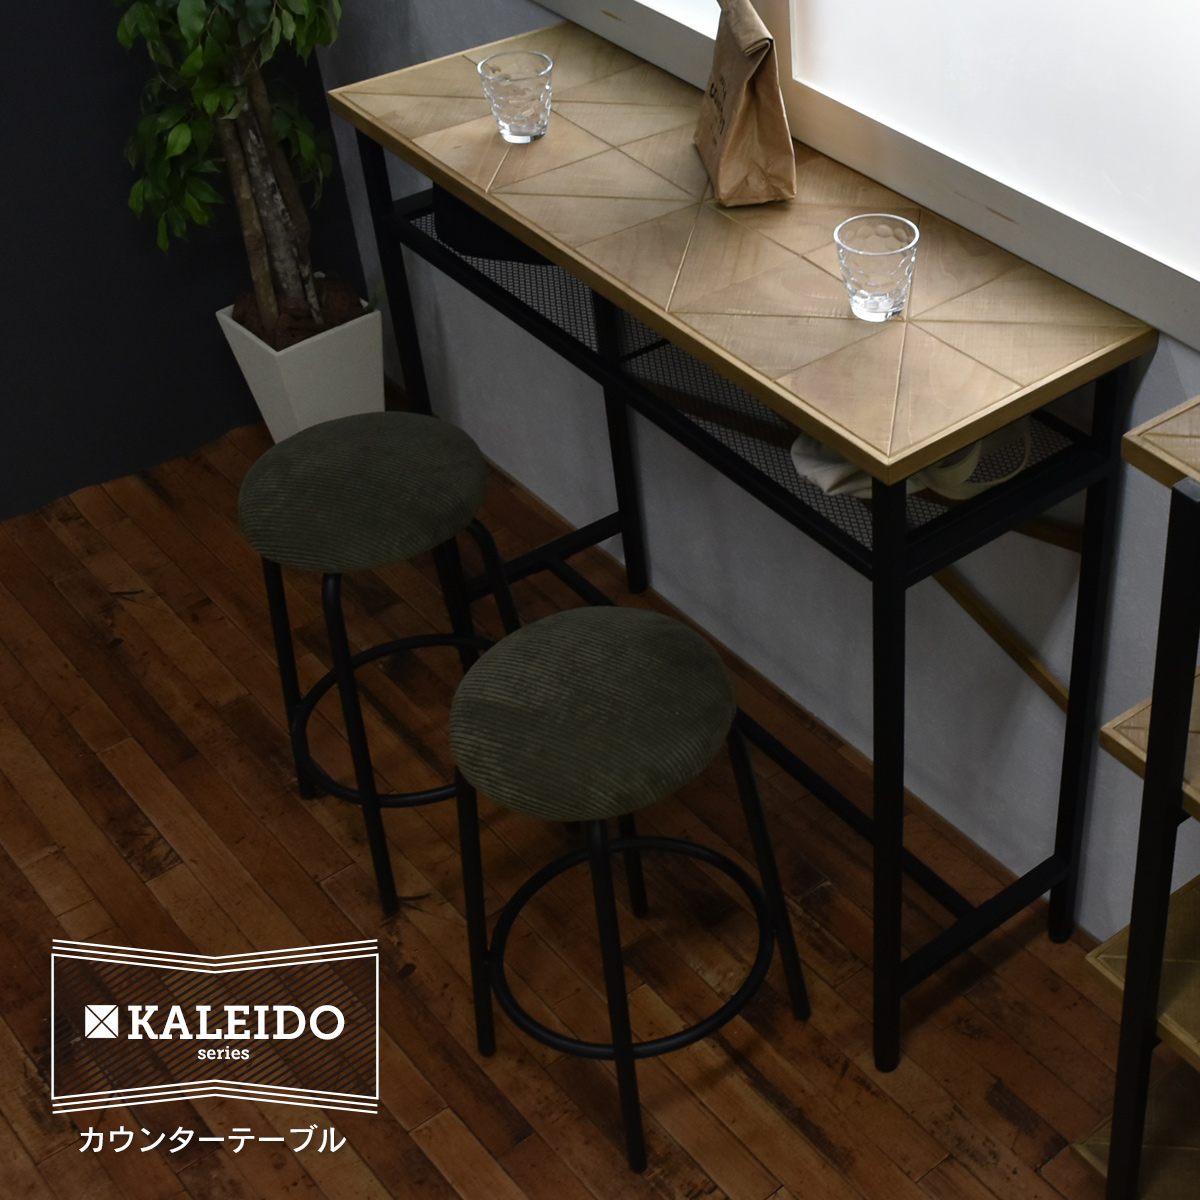 KALEIDO カレイド カウンターテーブル 幅110 KAHT-110 古材風 無骨 アイアン